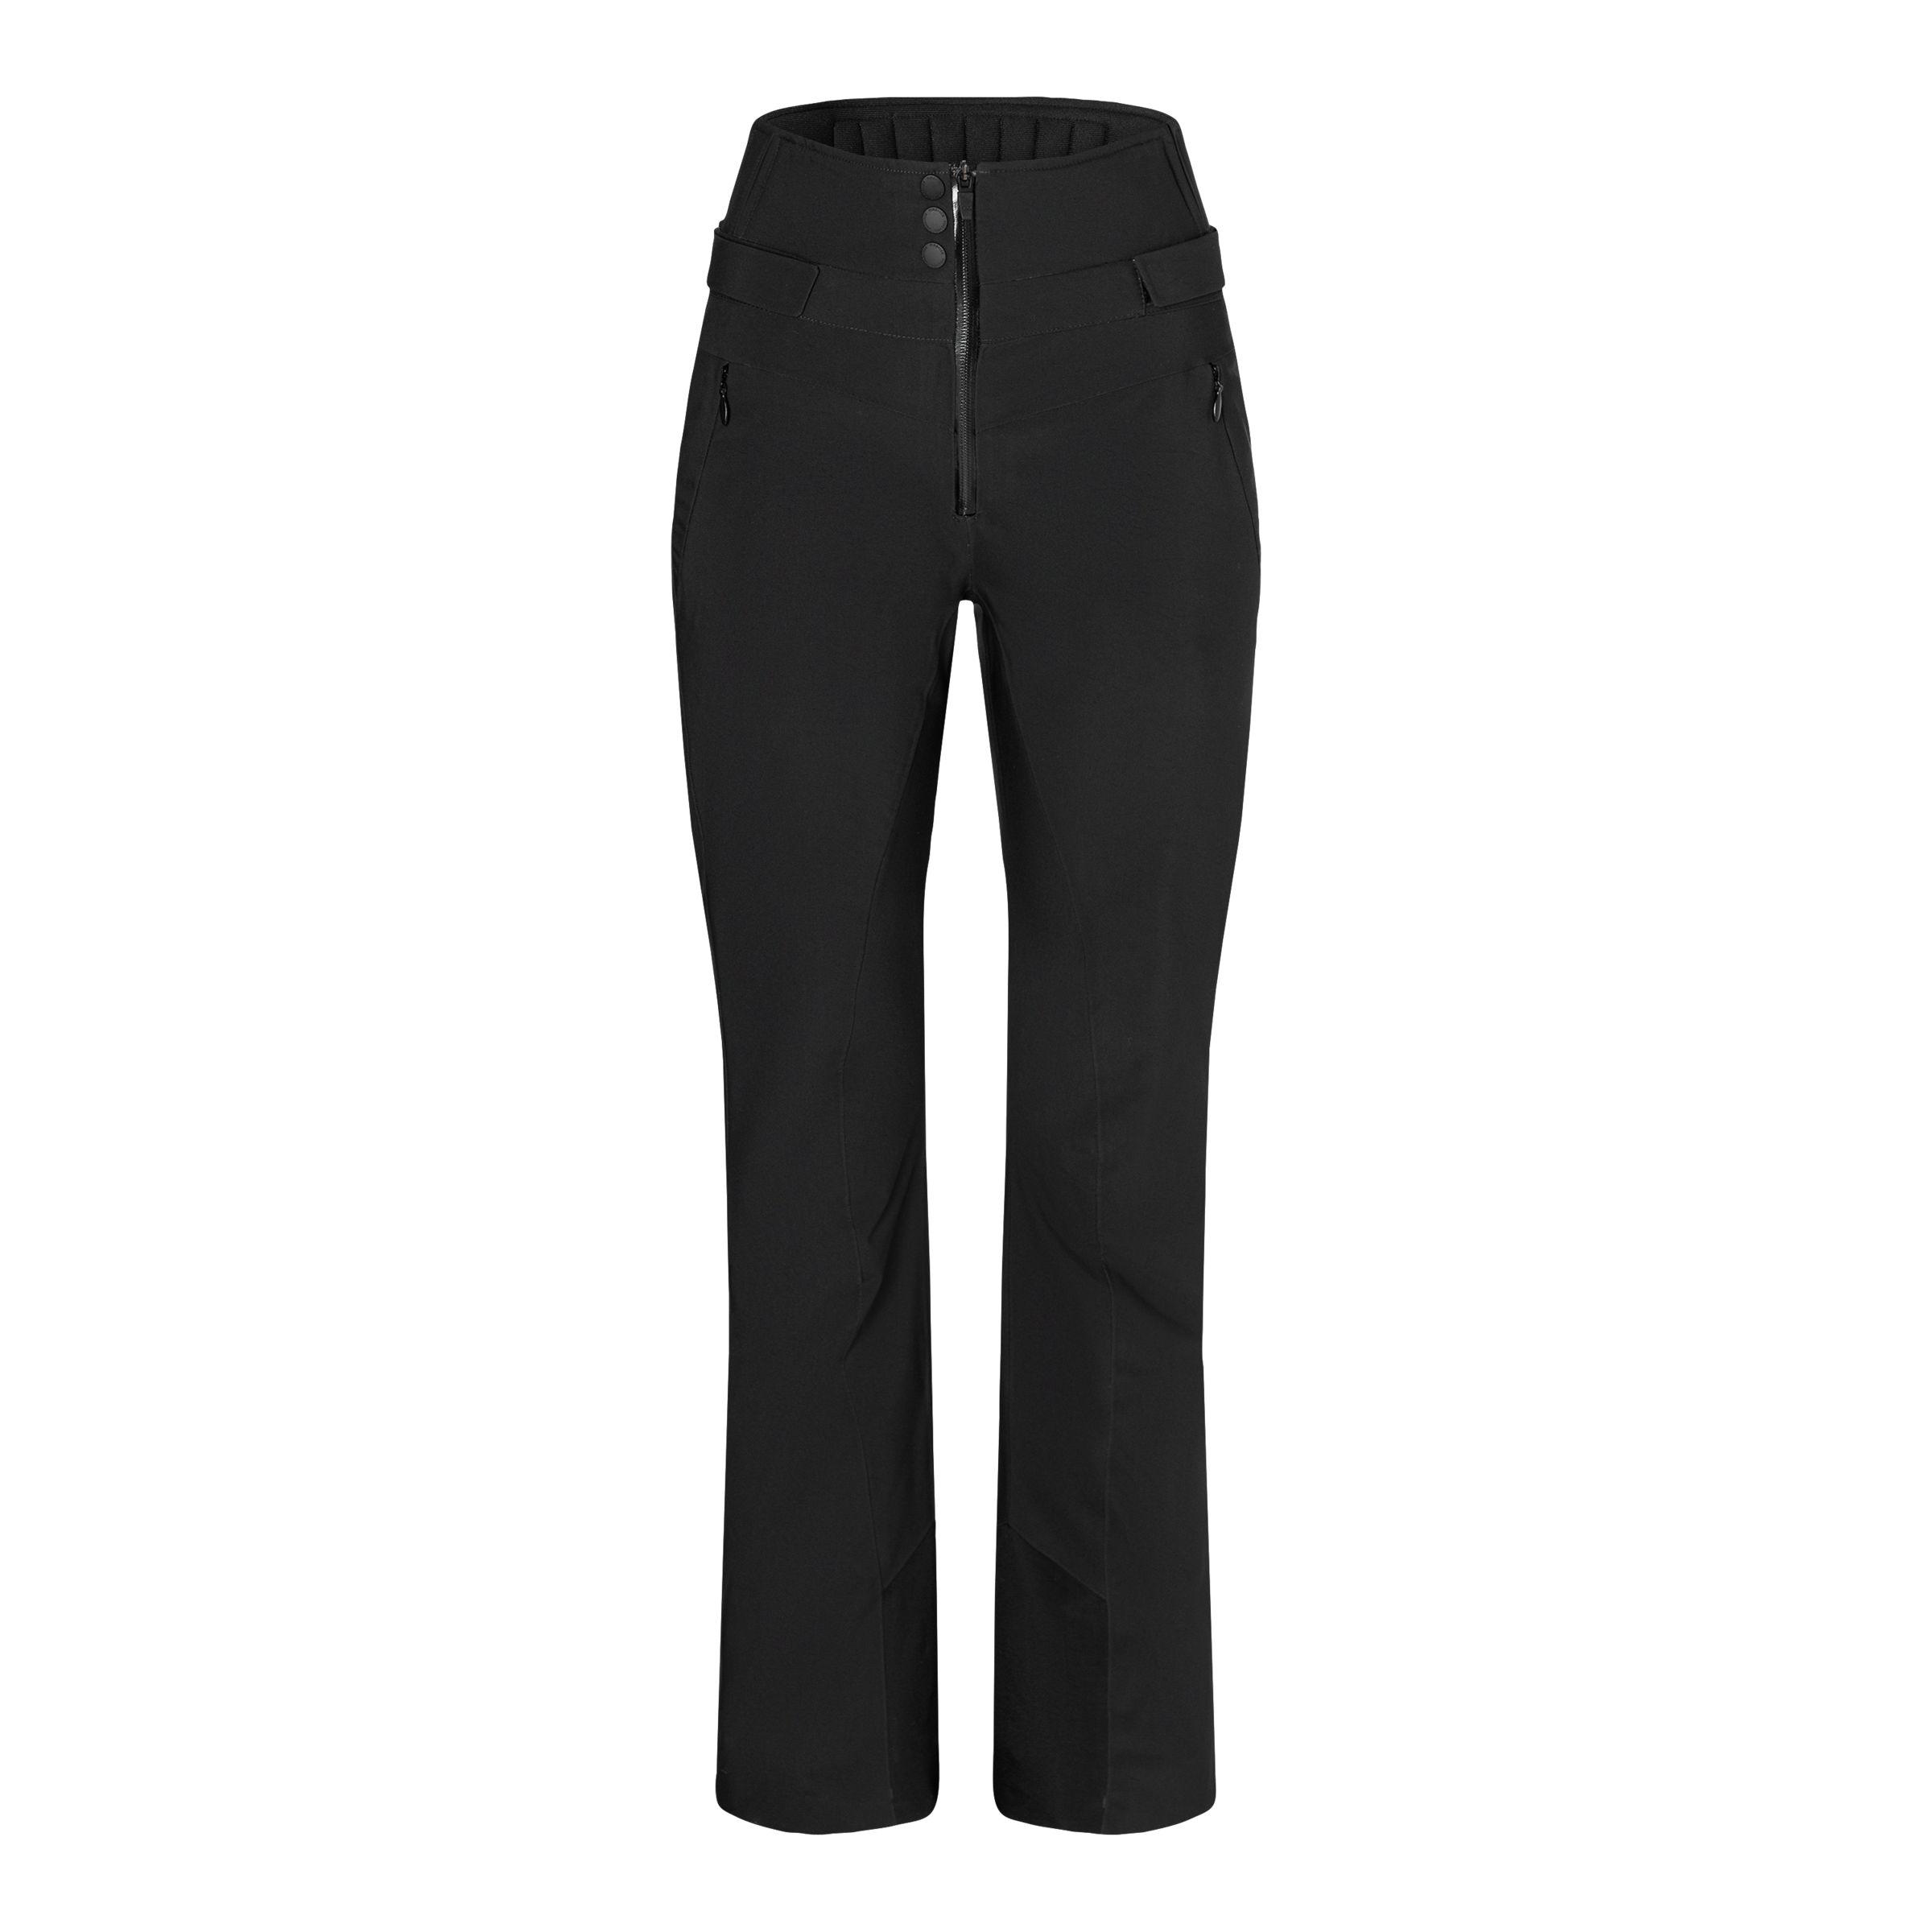 Ski & Snow Pants -  bogner fire and ice BORJA Ski Trousers